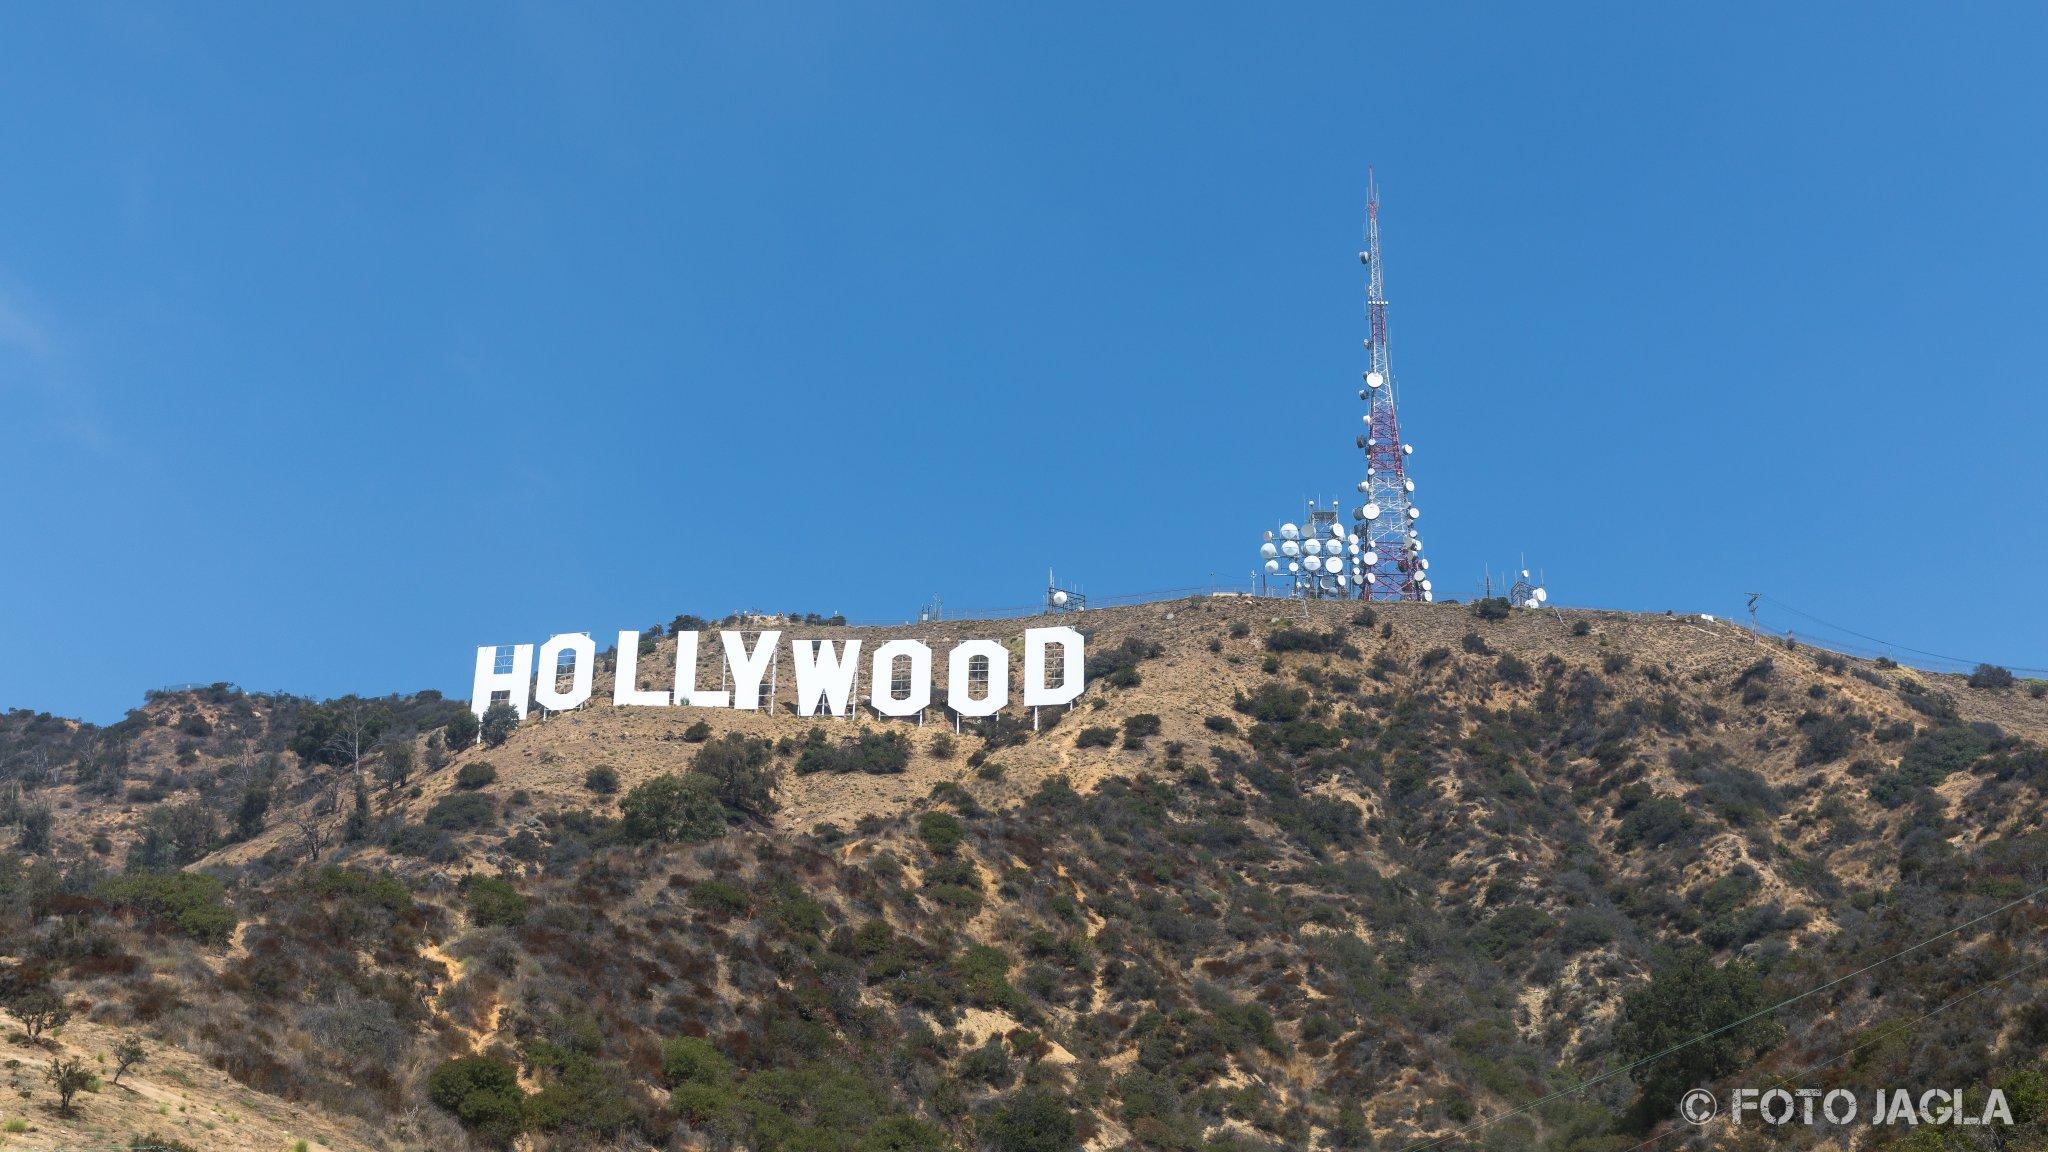 Kalifornien - September 2018 Hollywood Sign Los Angeles - Hollywood